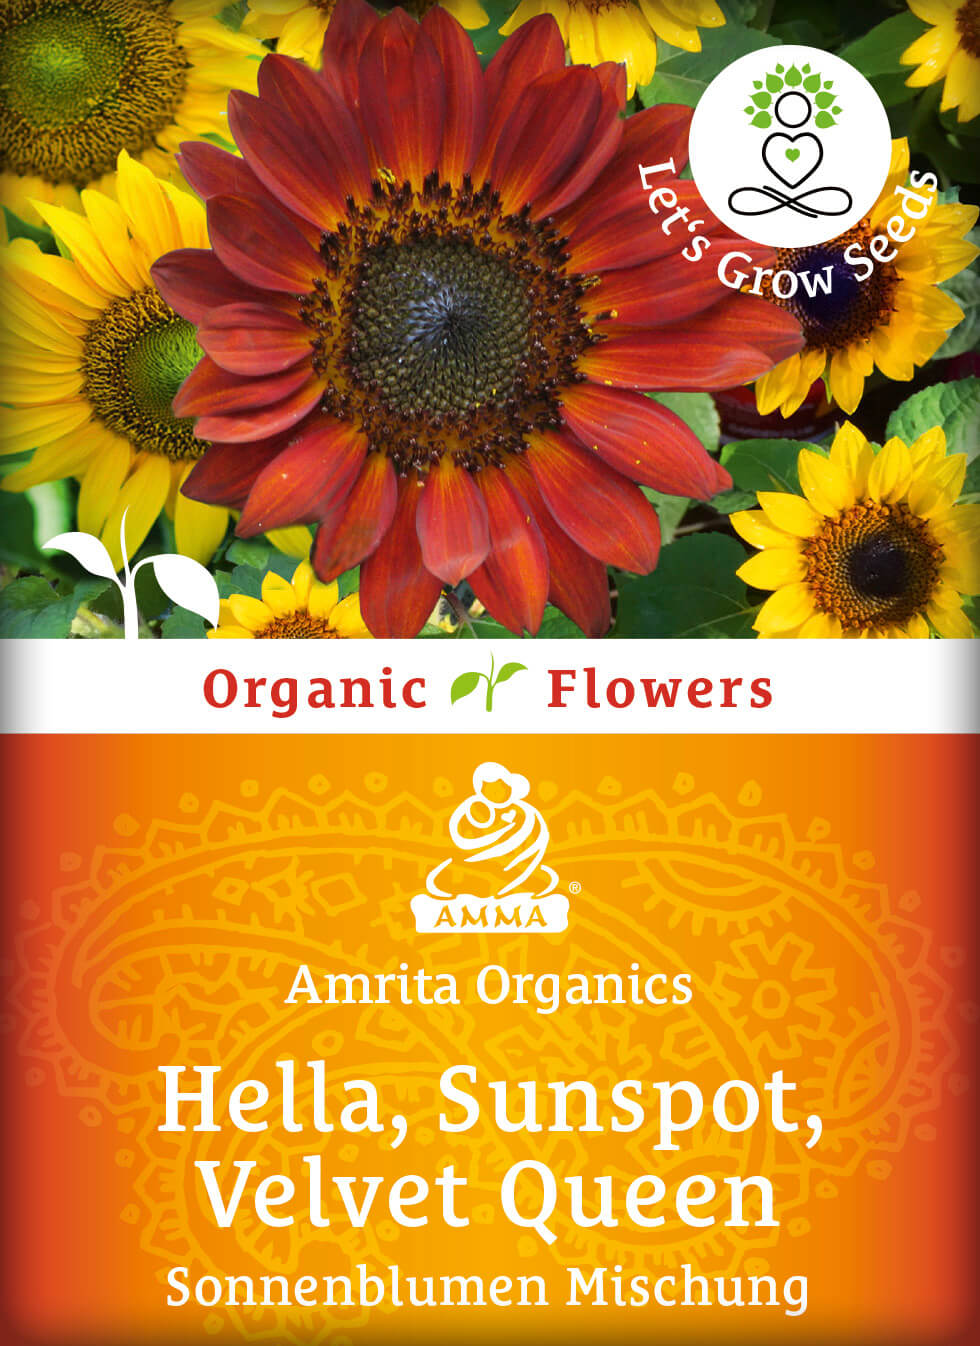 Sunflower-mix, organic